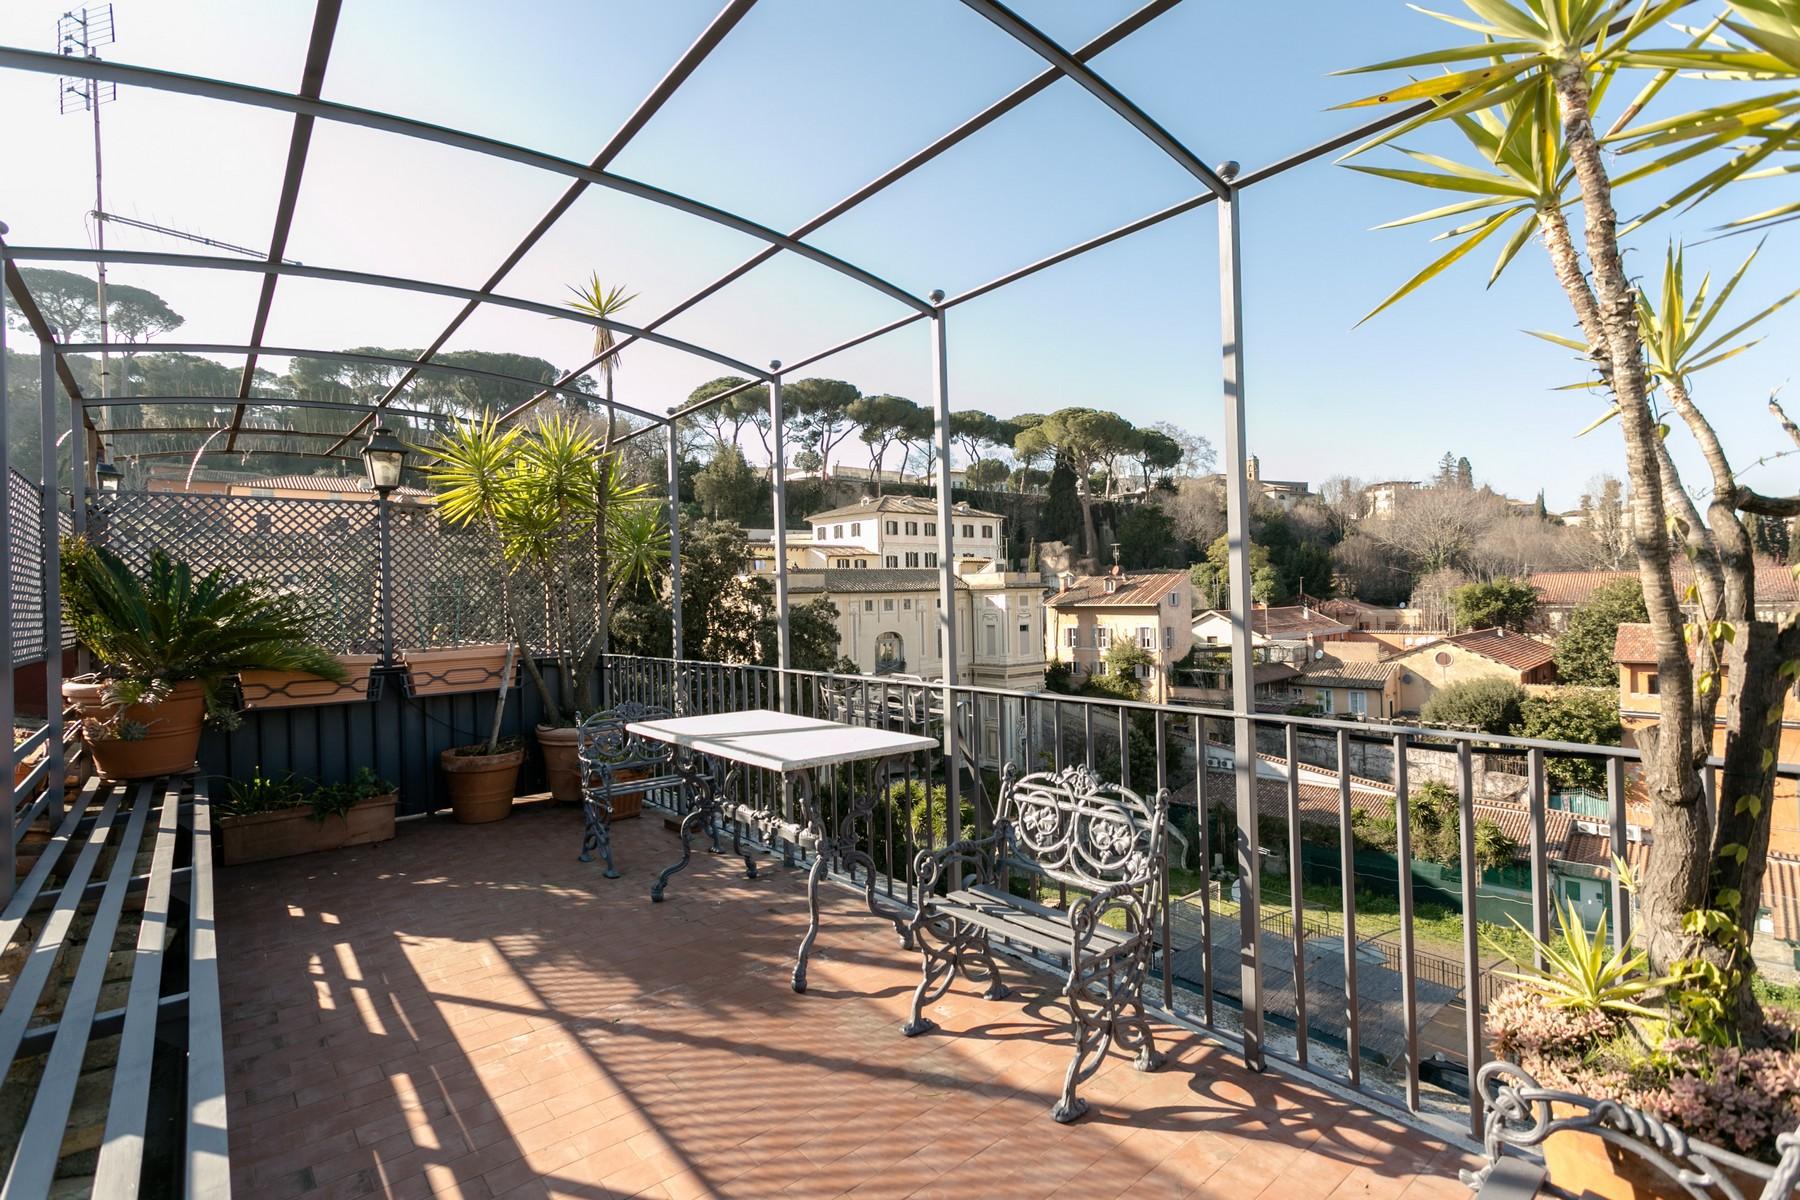 Wohnung für Verkauf beim Penthouse with terrace and carport in Trastevere Via delle Mantellate Rome, Rome, 00165 Italien